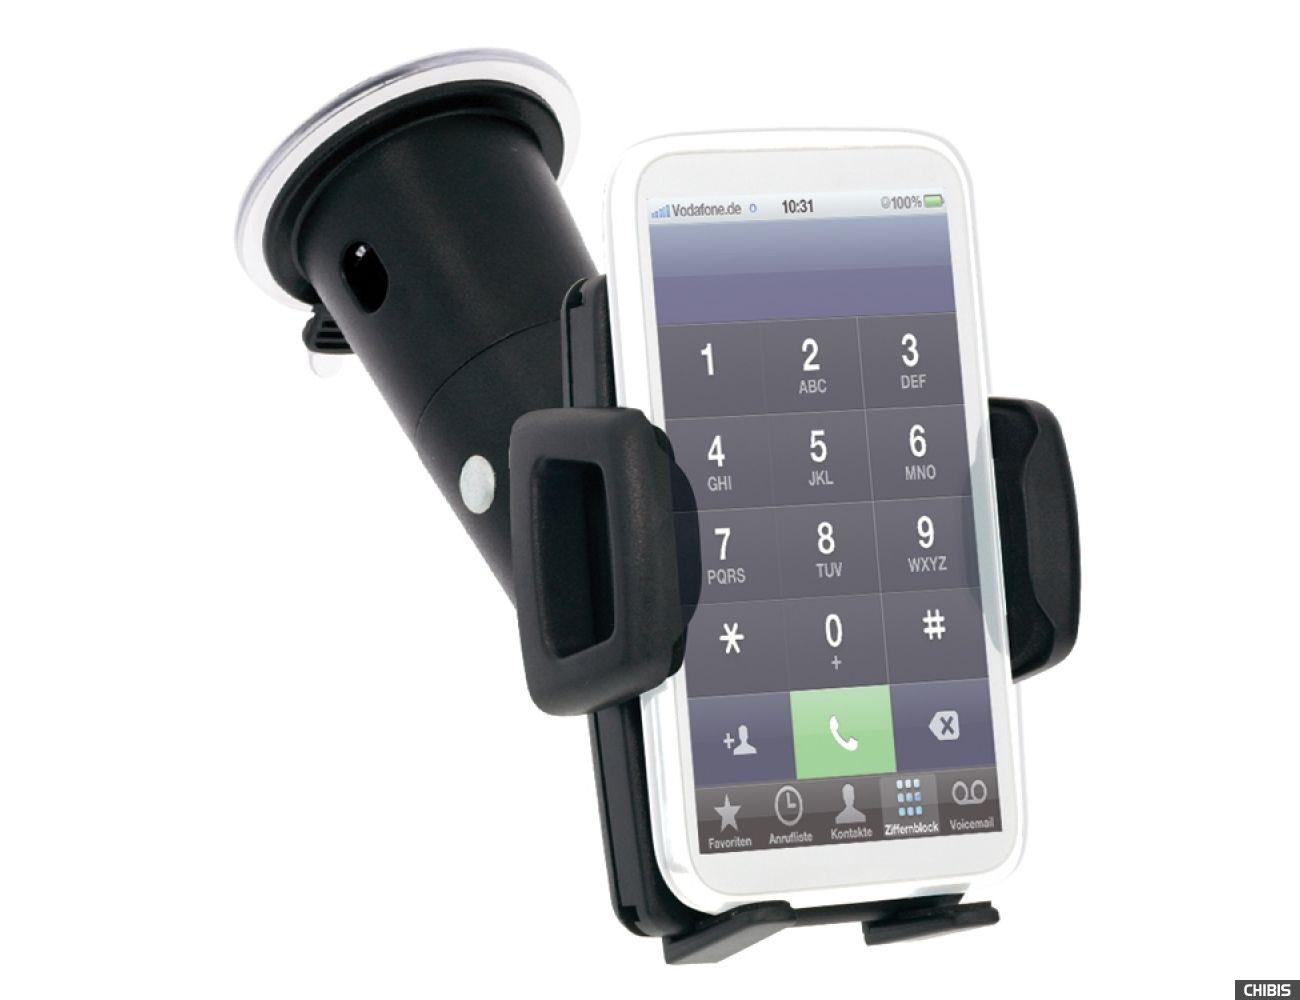 Автодержатель на стекло iGrip ROK Kit (T5-1223) для смартфонов